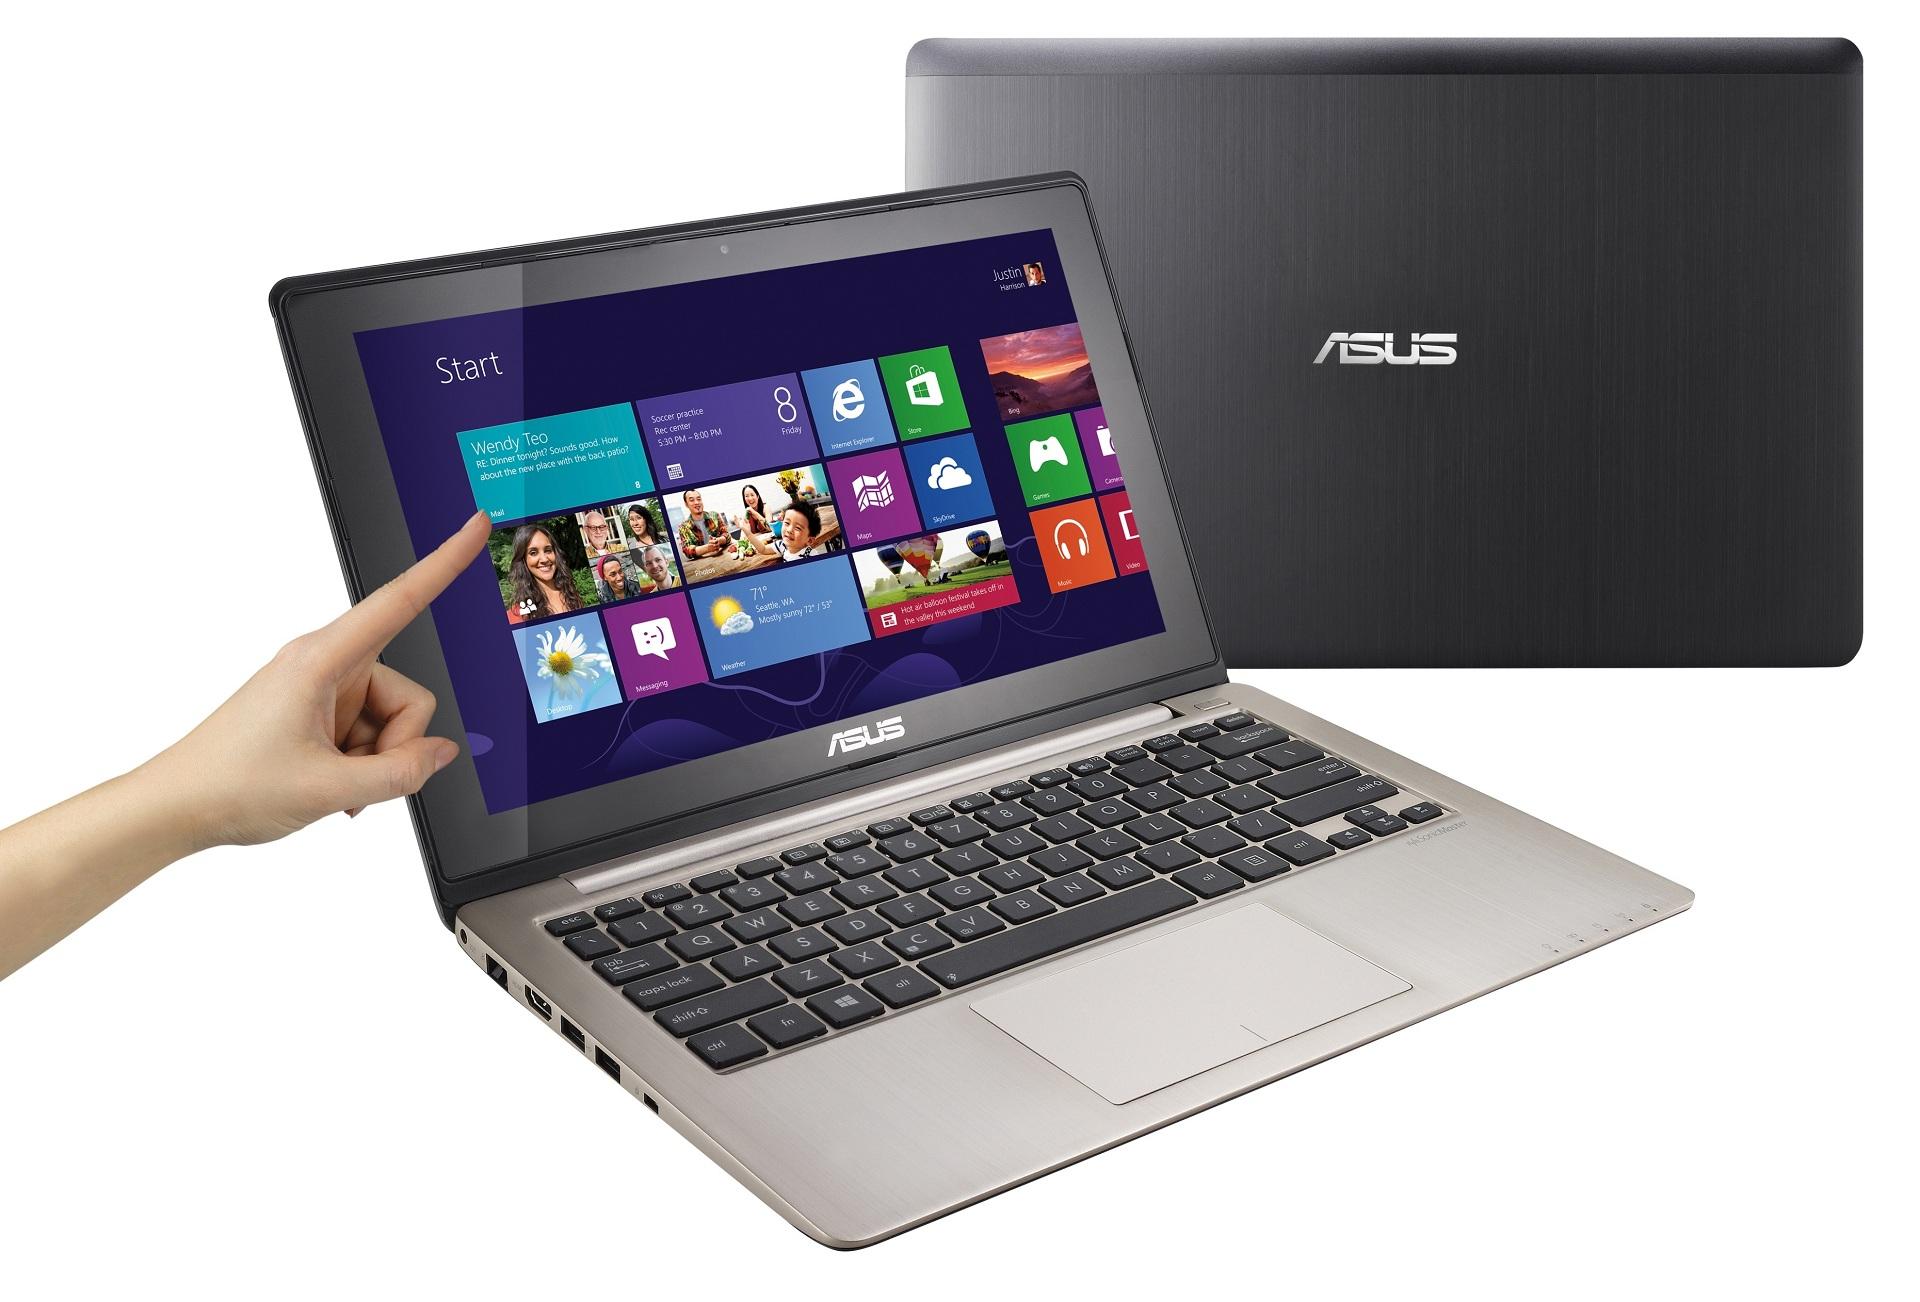 Best Windows 8 Laptop